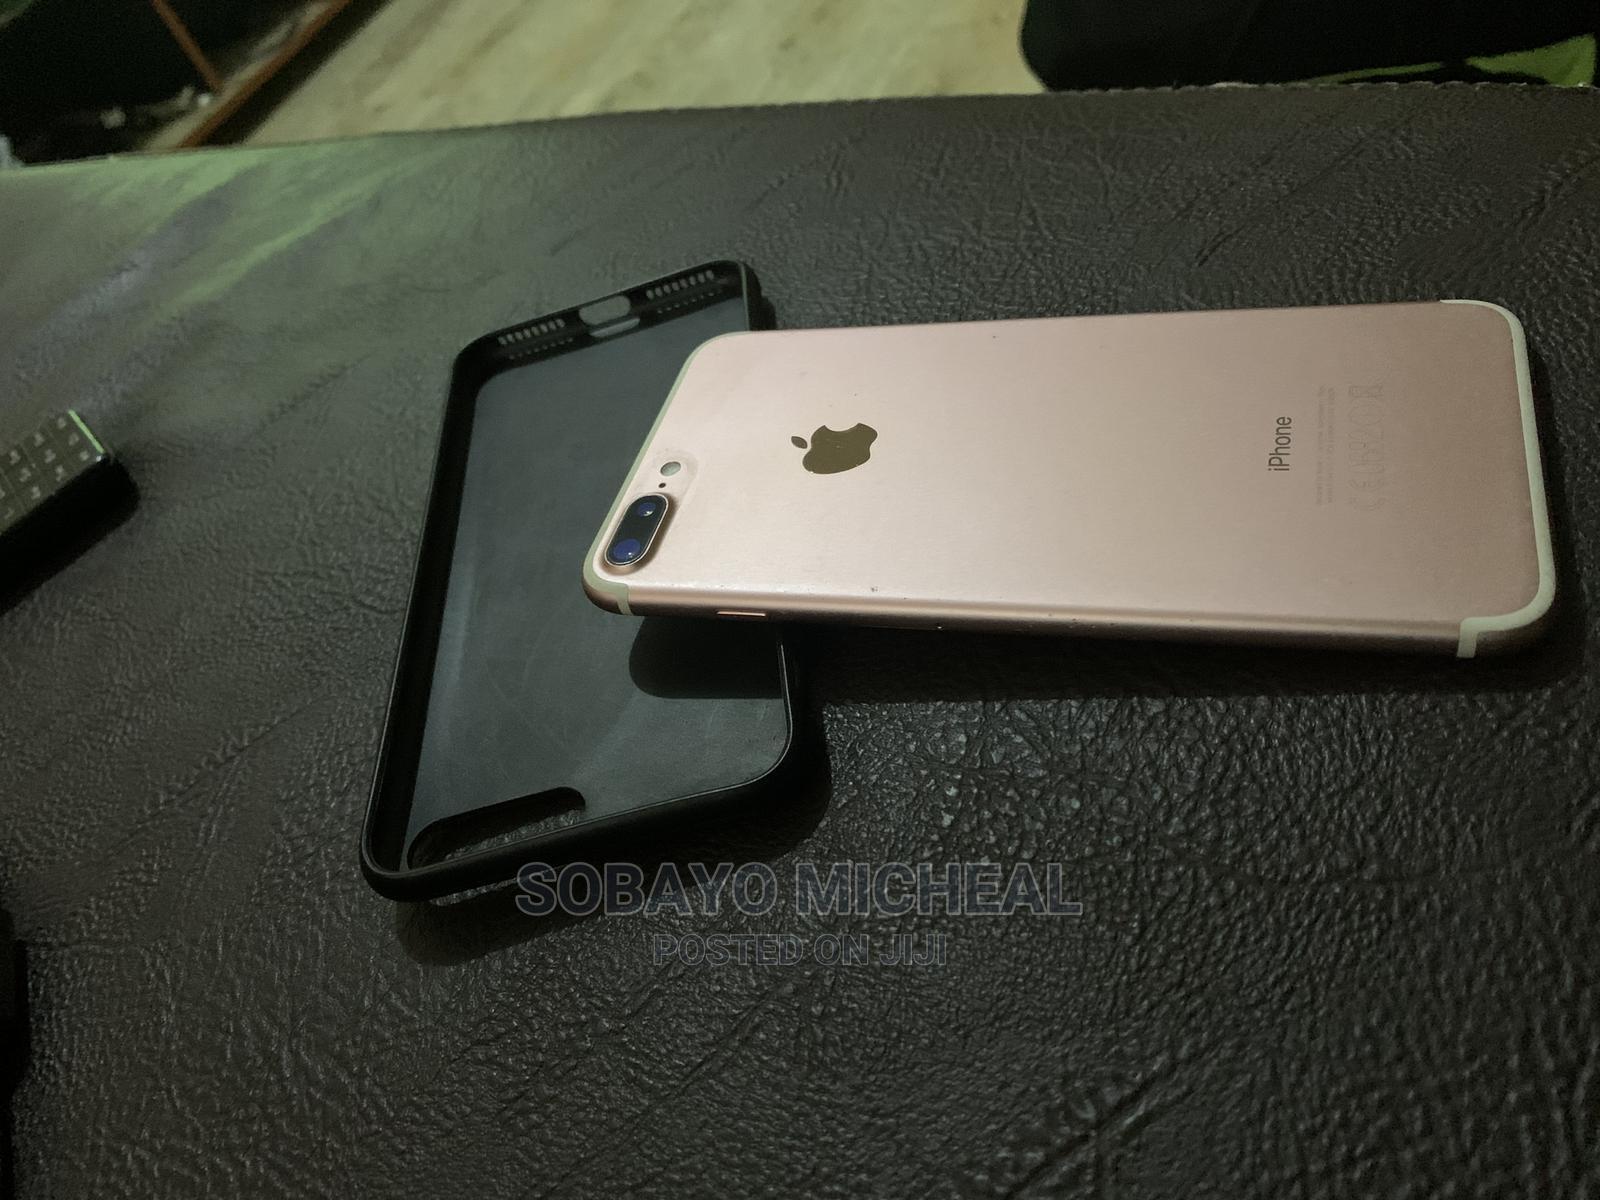 Apple iPhone 7 Plus 32 GB Gold   Mobile Phones for sale in Ibadan, Oyo State, Nigeria